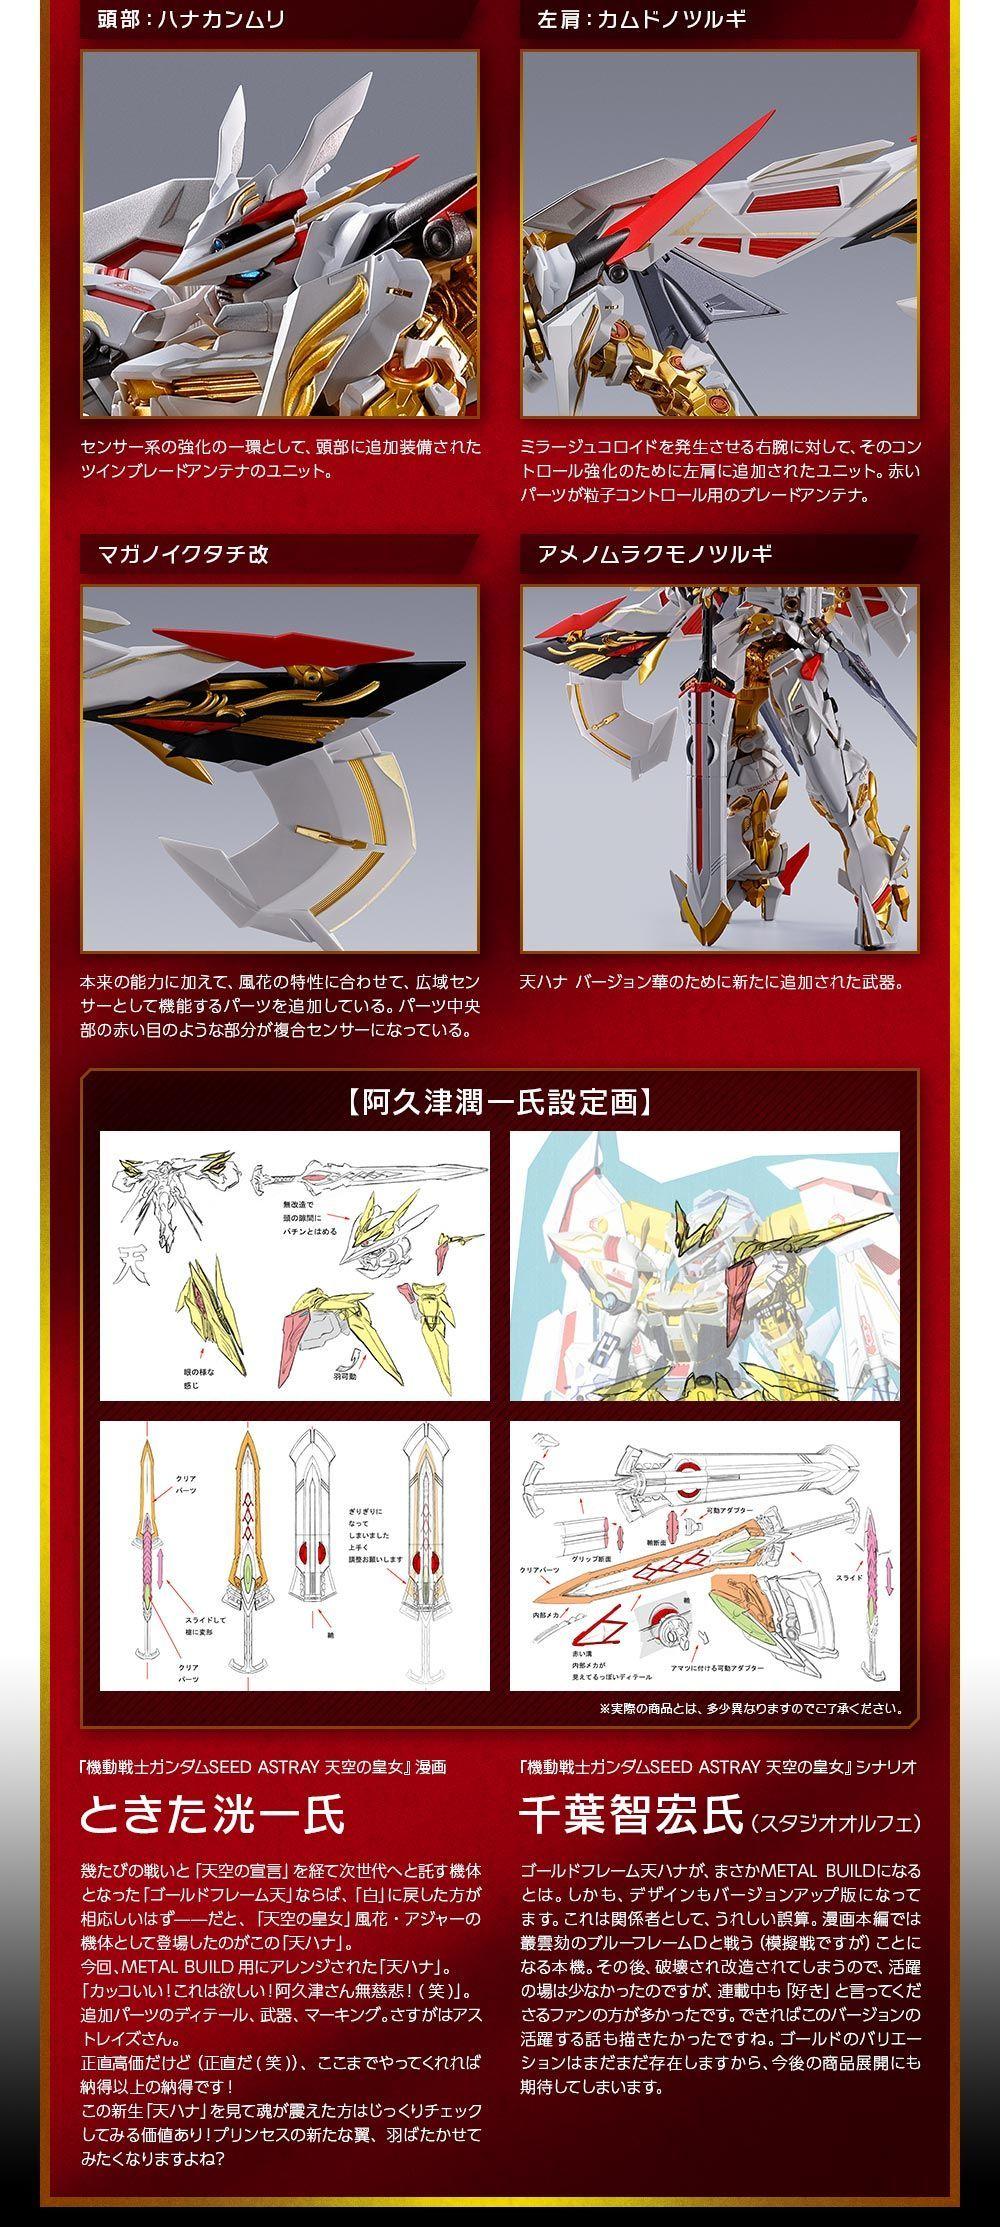 METAL BUILD ガンダムアストレイ ゴールドフレーム天ハナ バージョン華03